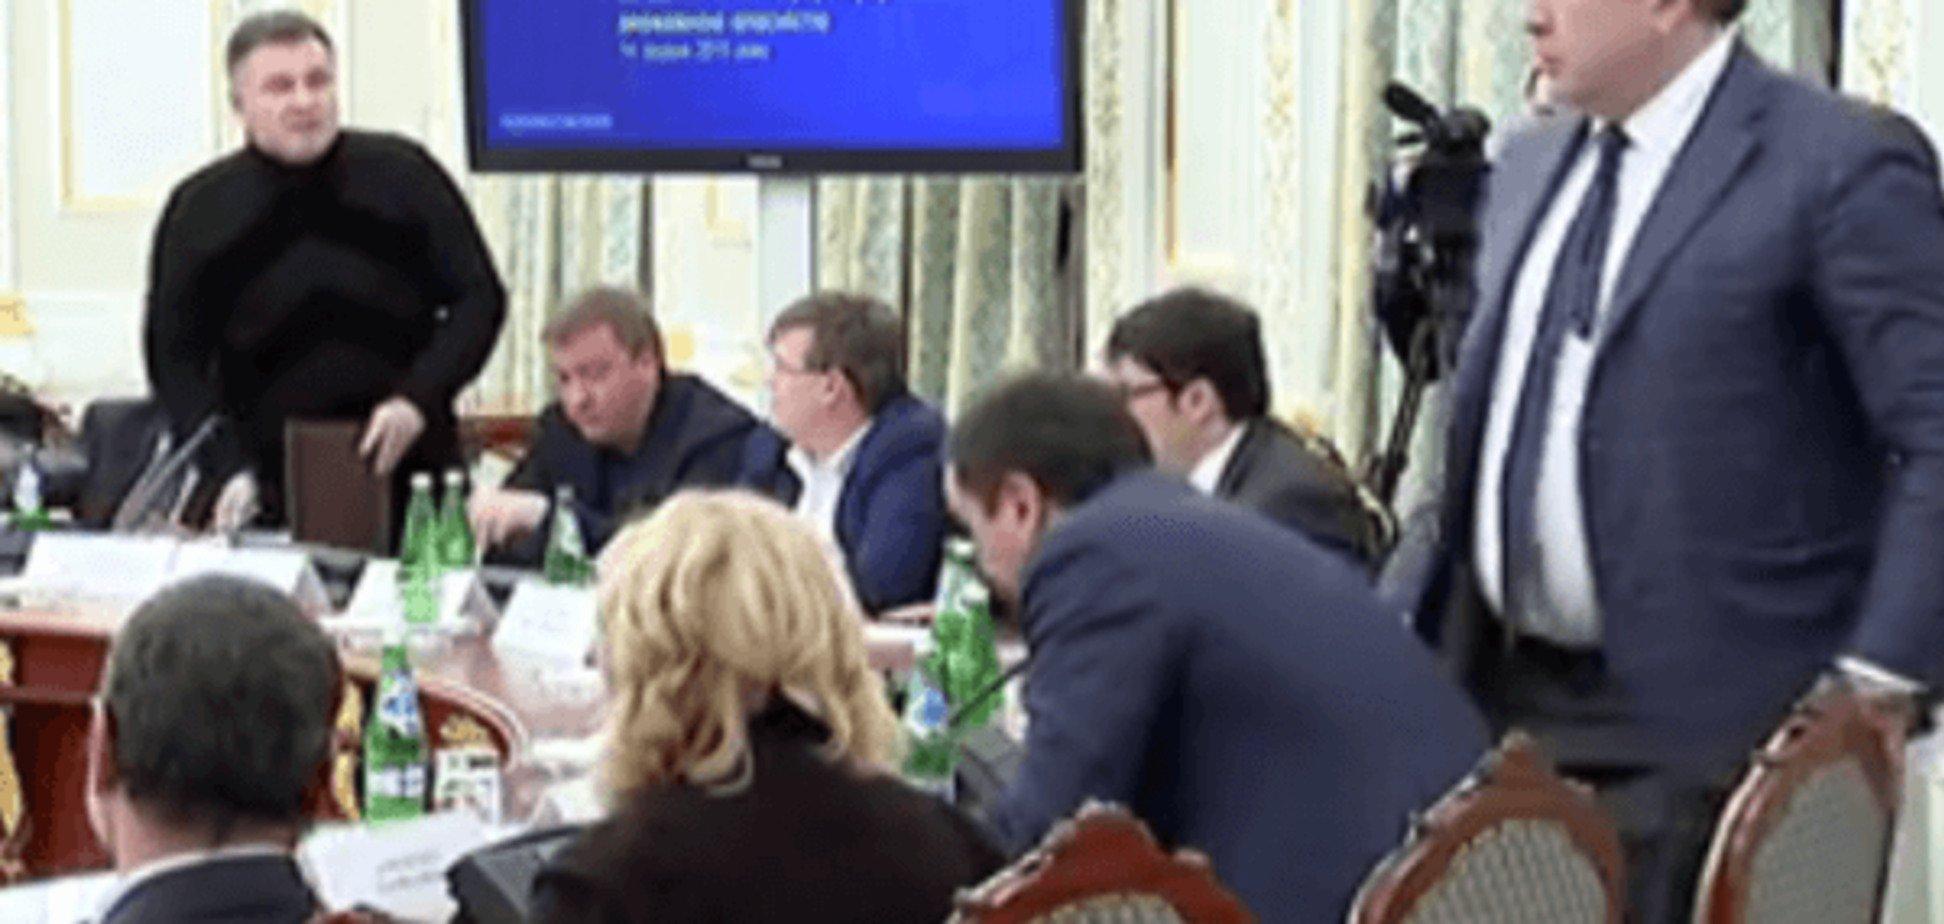 Киселев о последствиях скандала между Аваковым и Саакашвили: нет худа без добра